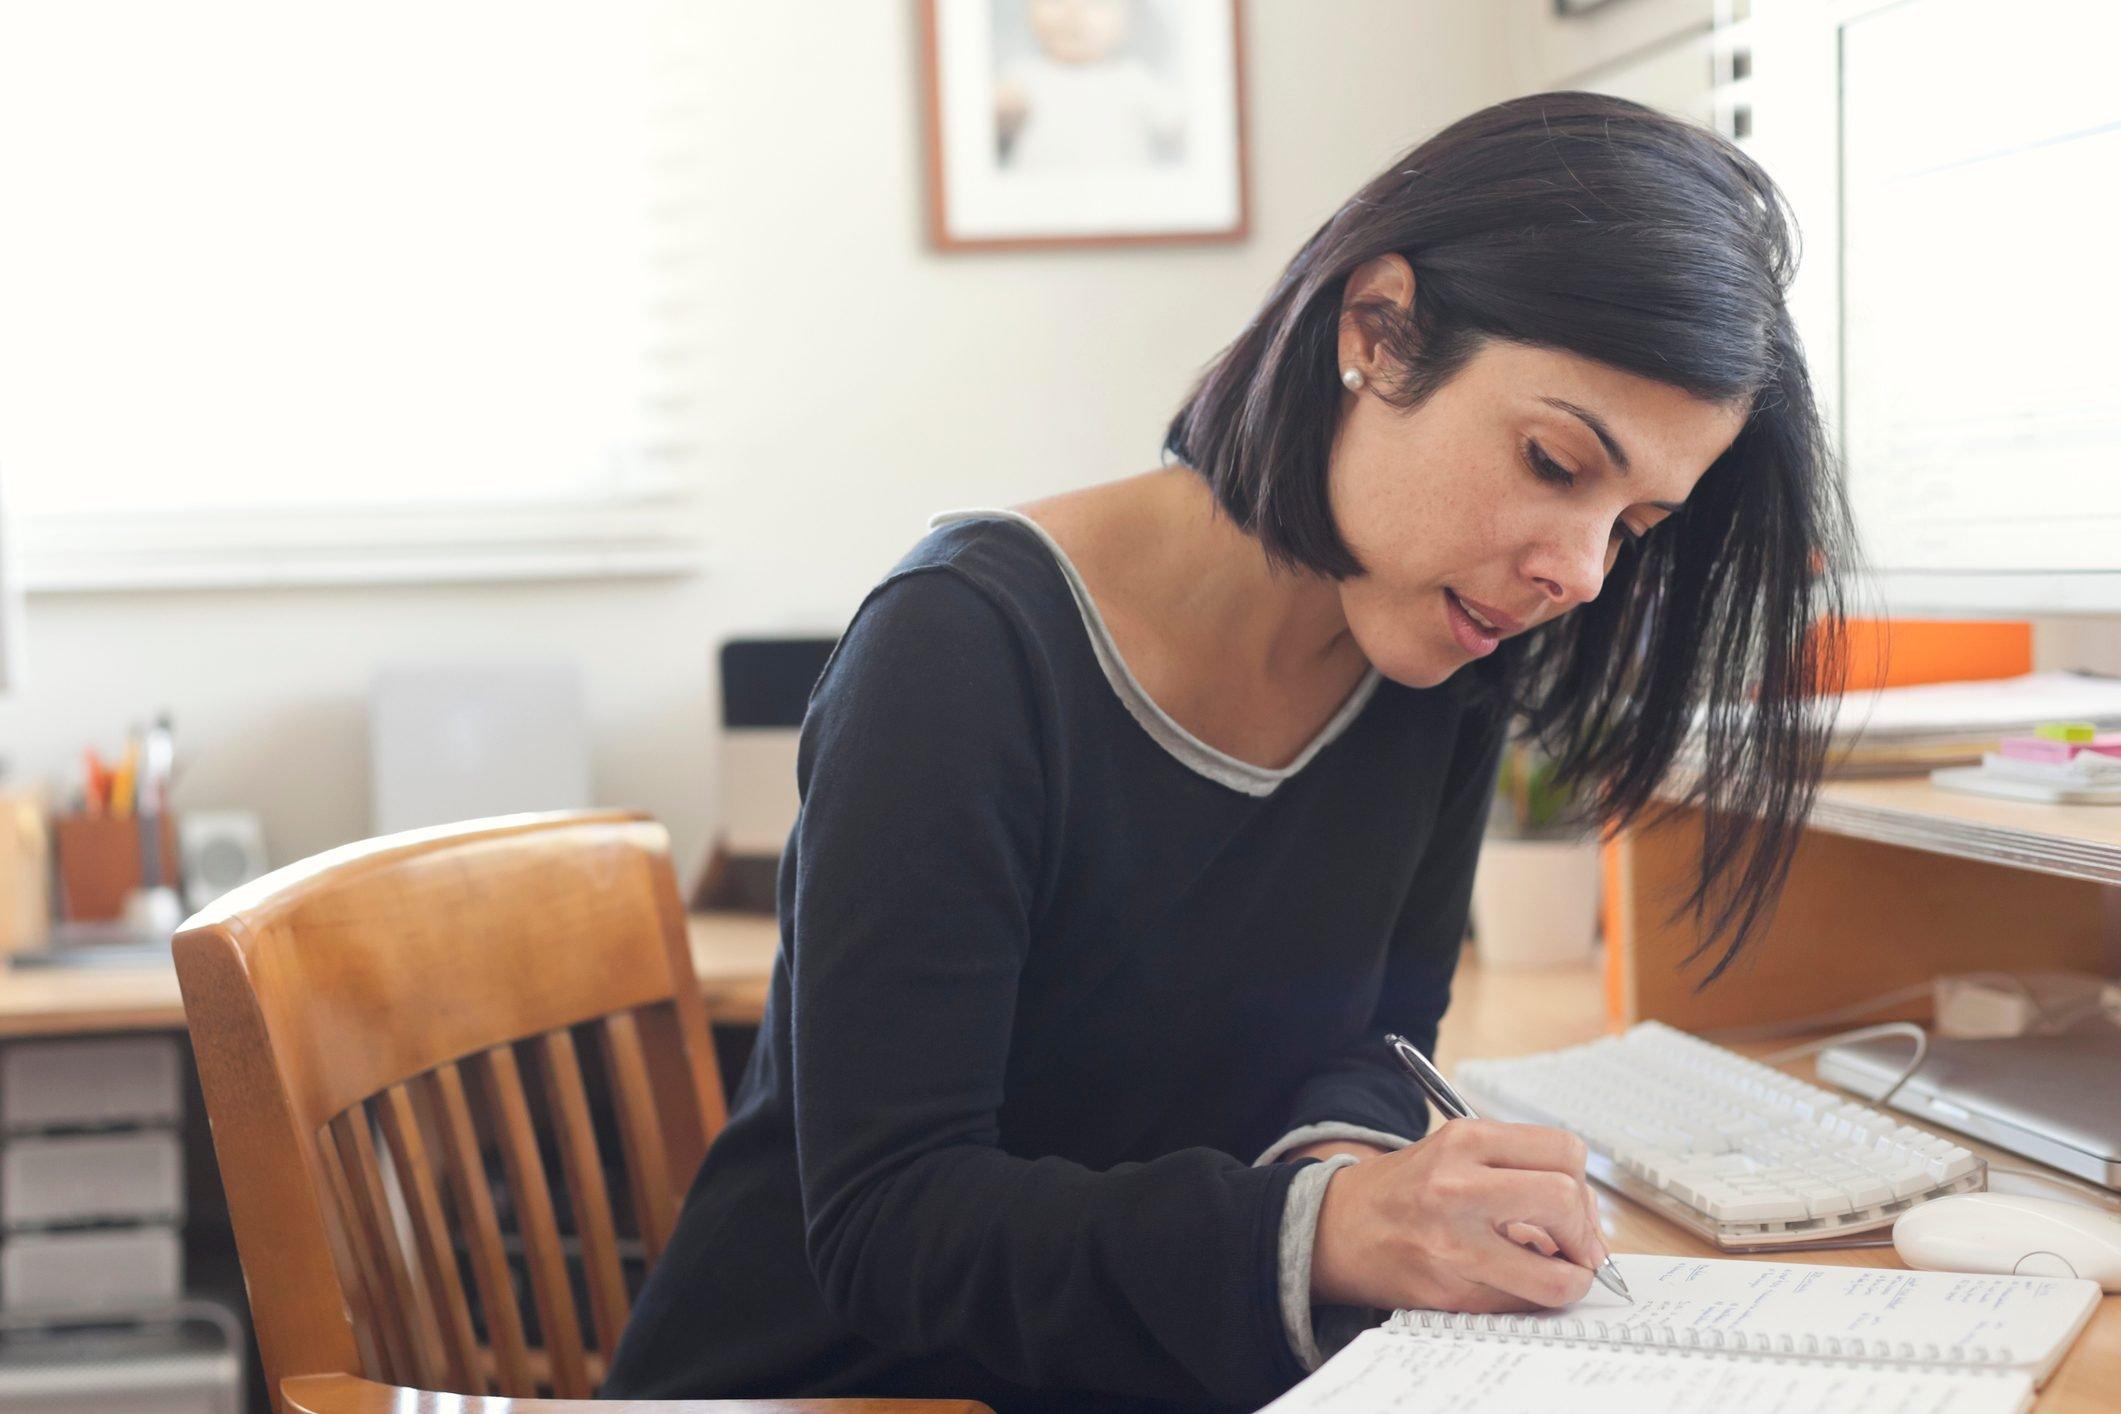 Hispanic woman working in home office